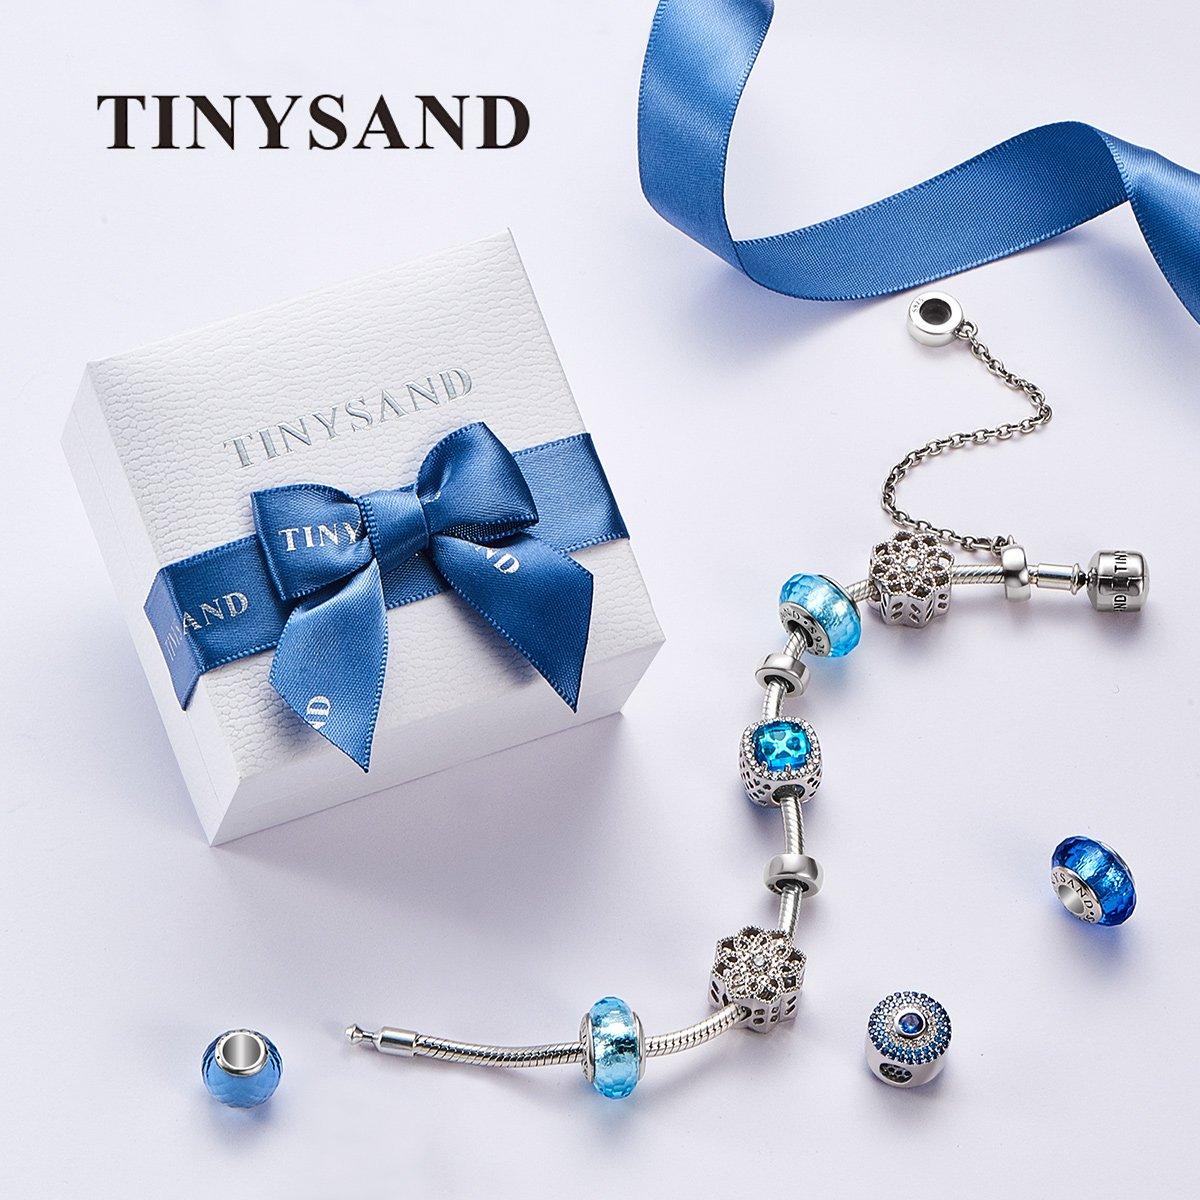 TINYSAND 13.65*12.50*8.73 Perle Europeenne Fleur Avec Zircon Vert 925 Argent Sterling Charms et Breloque